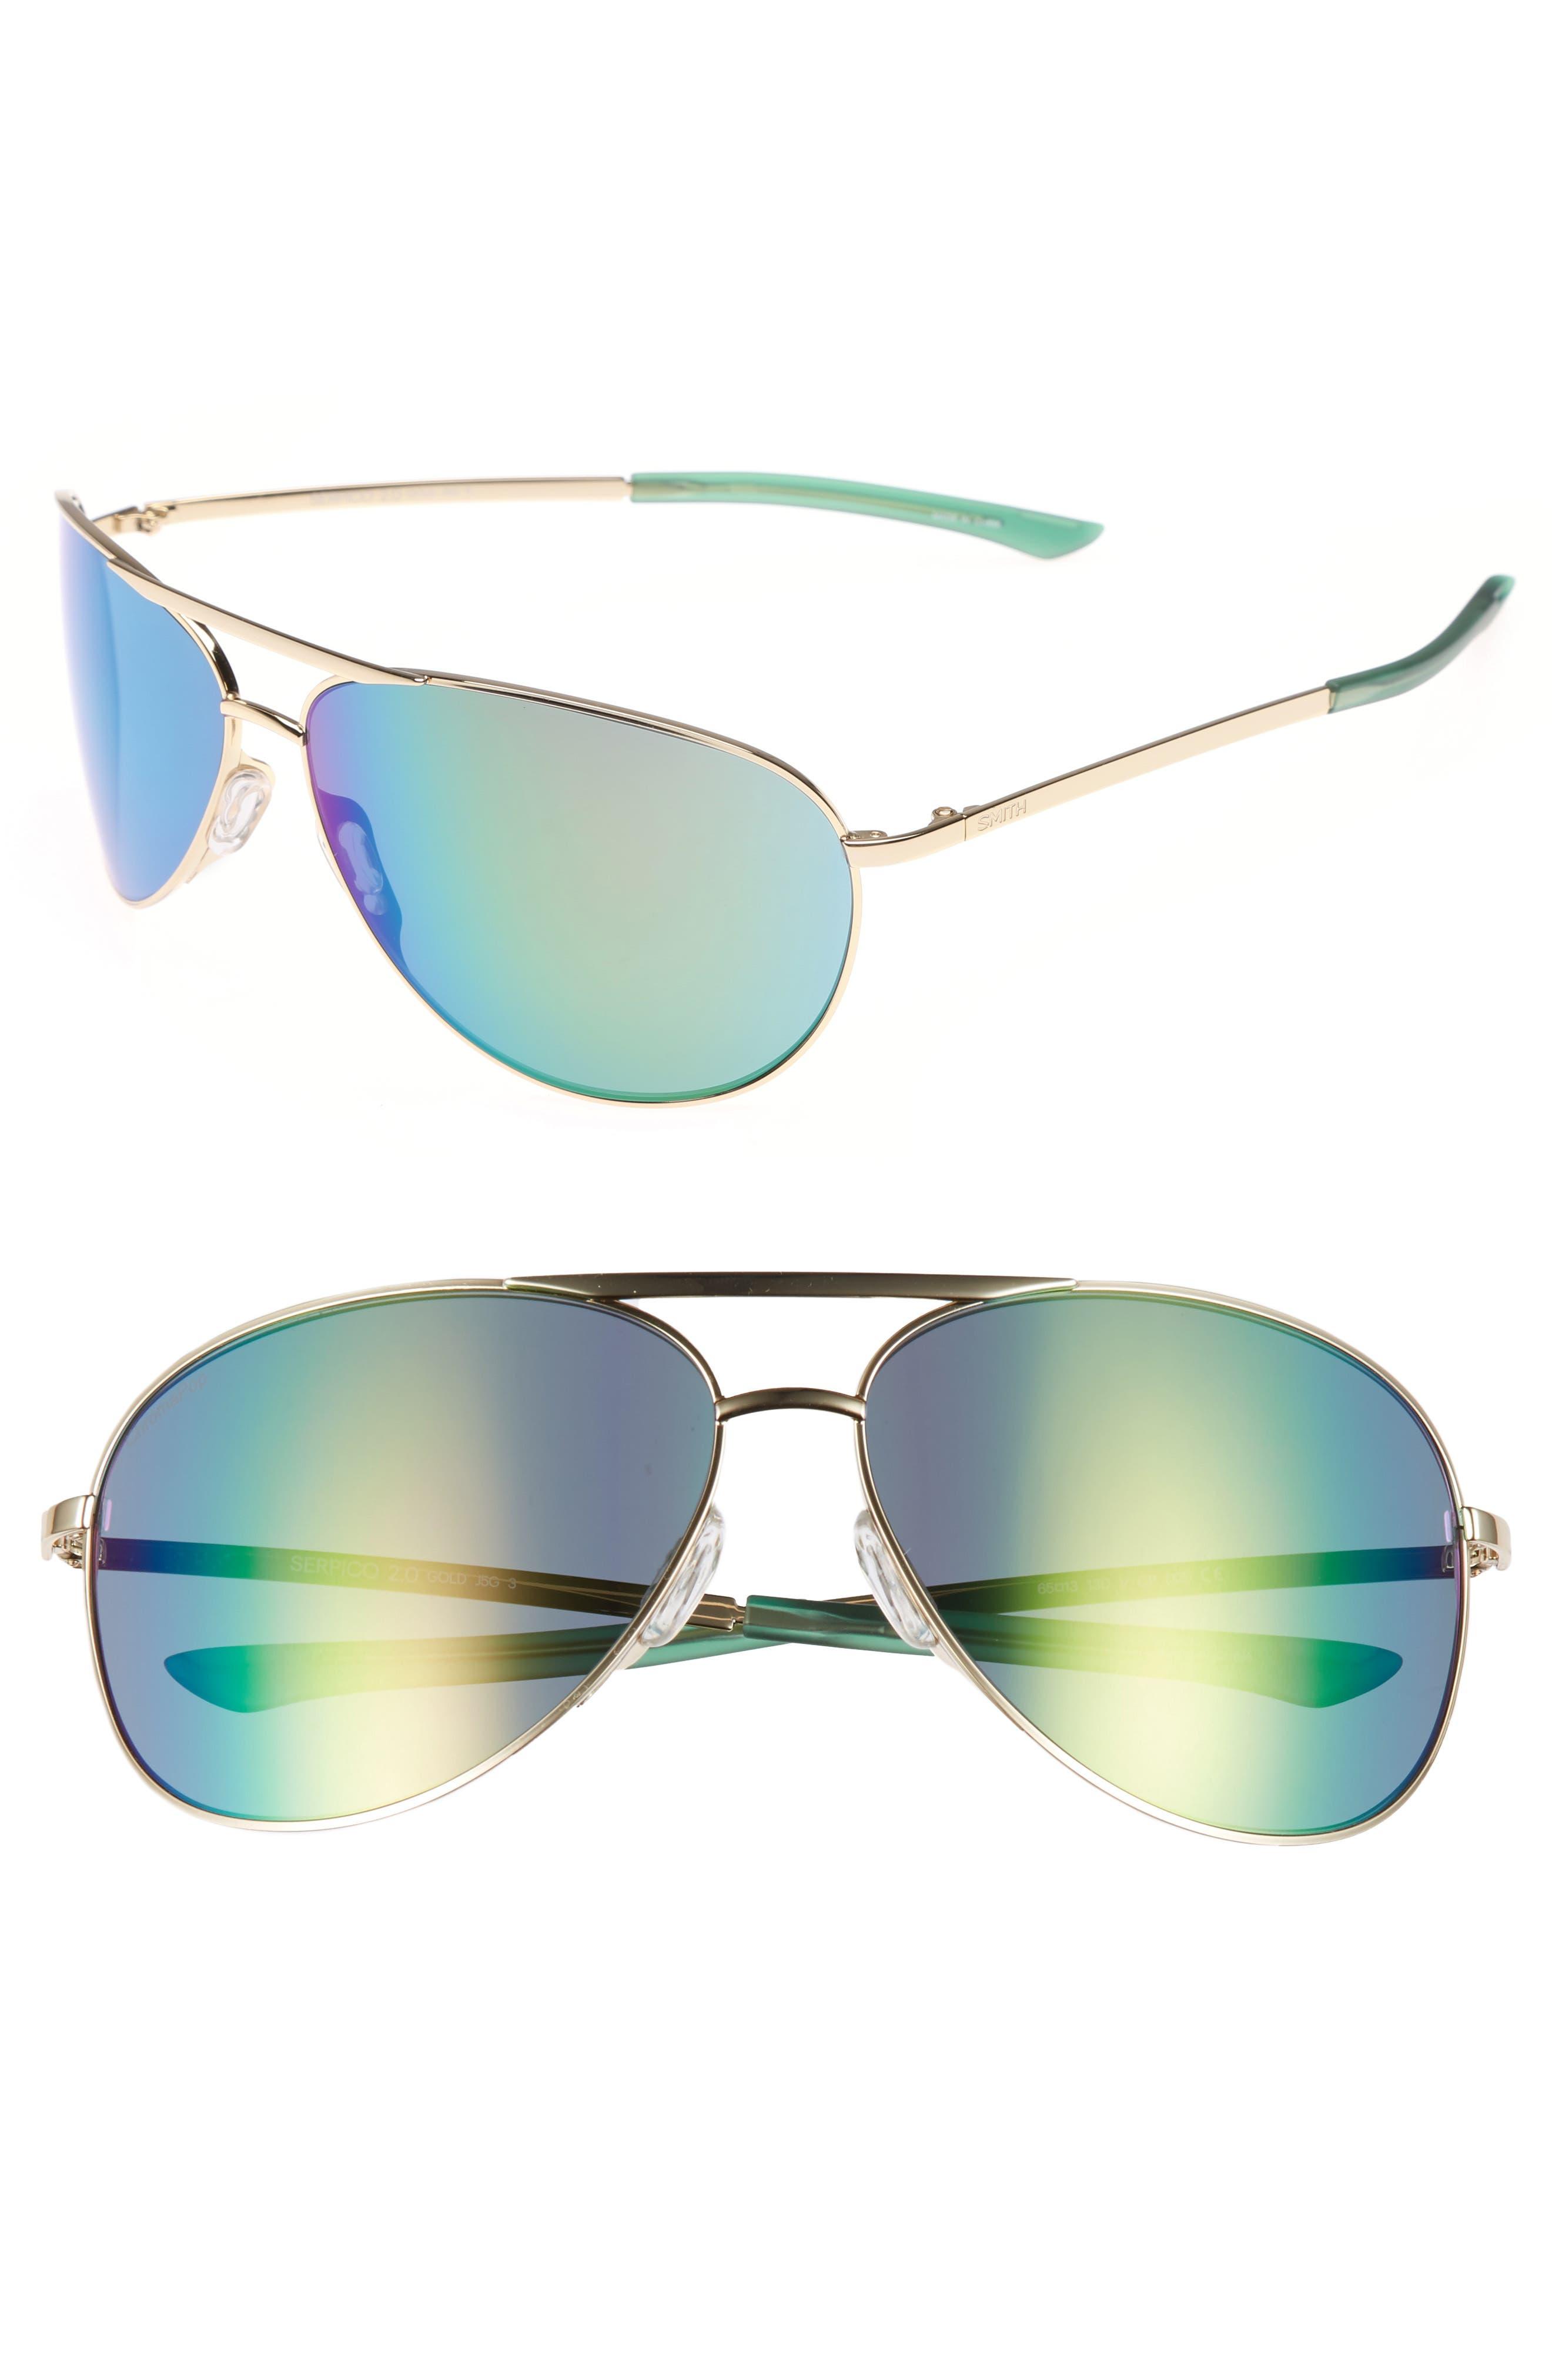 Serpico 2 65mm Mirrored ChromaPop<sup>™</sup> Polarized Aviator Sunglasses,                         Main,                         color, Gold/ Green Mirror